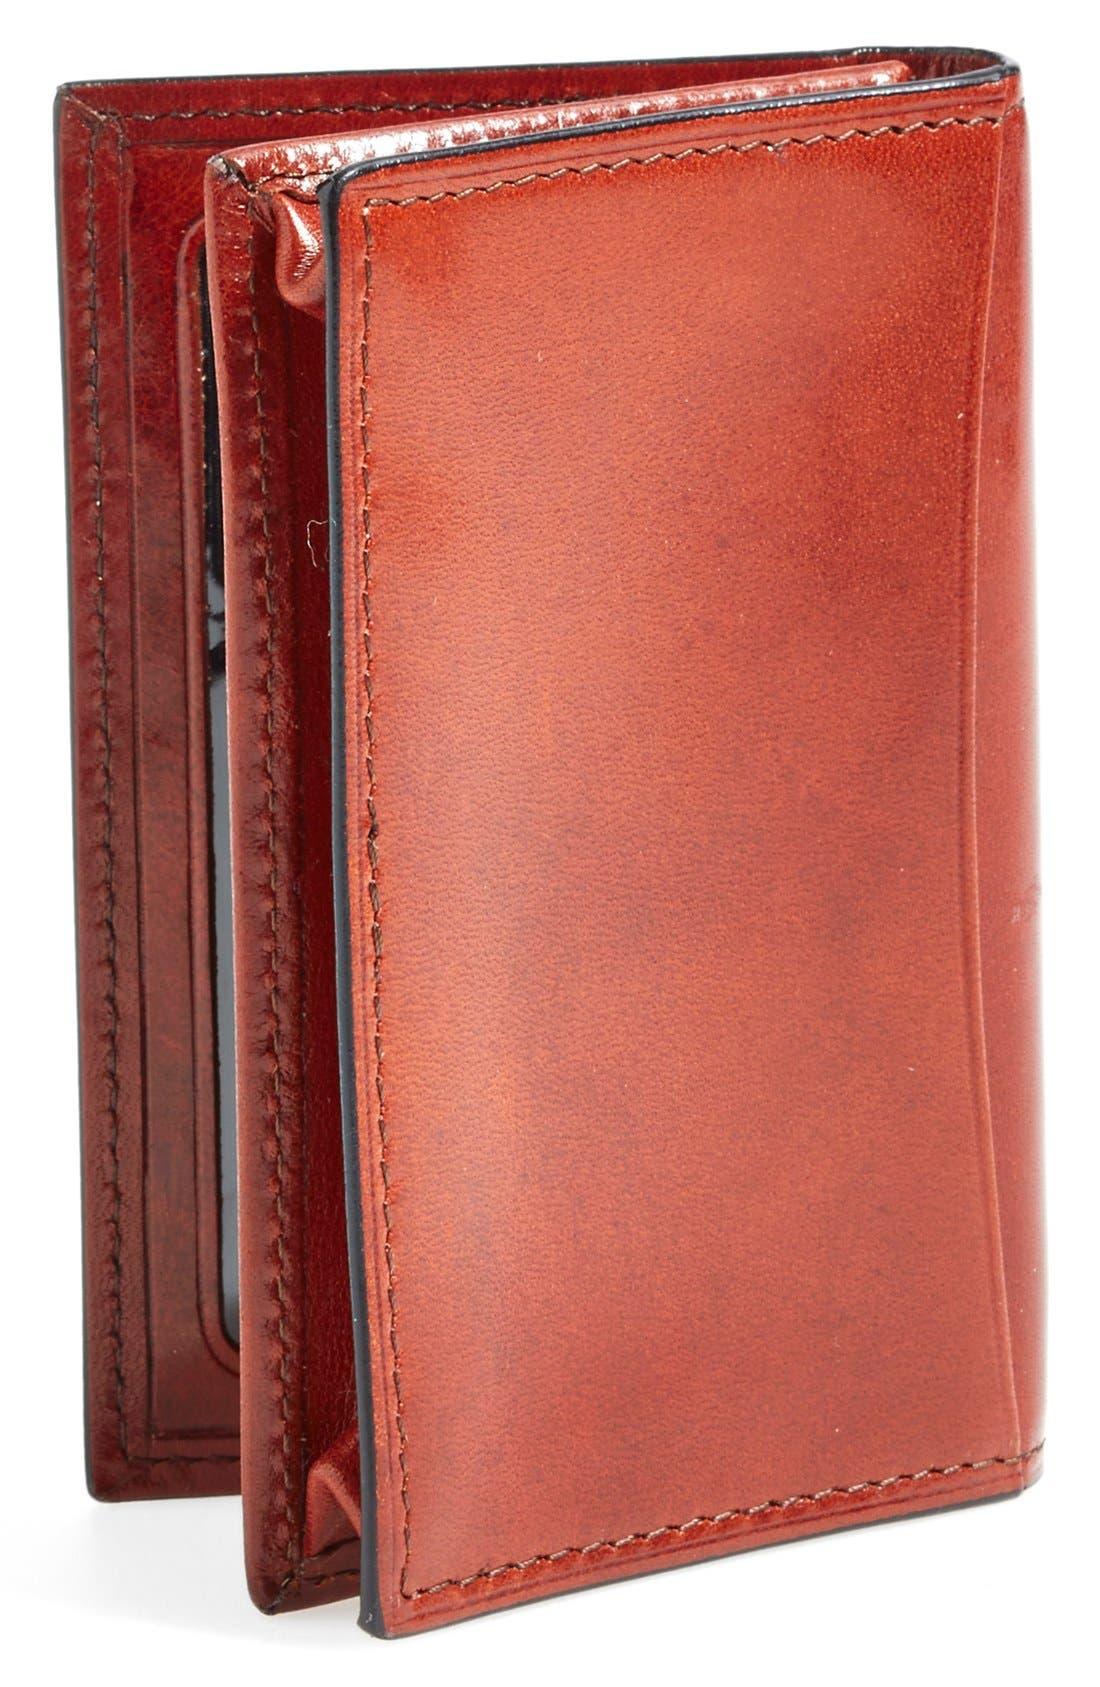 'Old Leather' Gusset Wallet,                             Alternate thumbnail 2, color,                             COGNAC